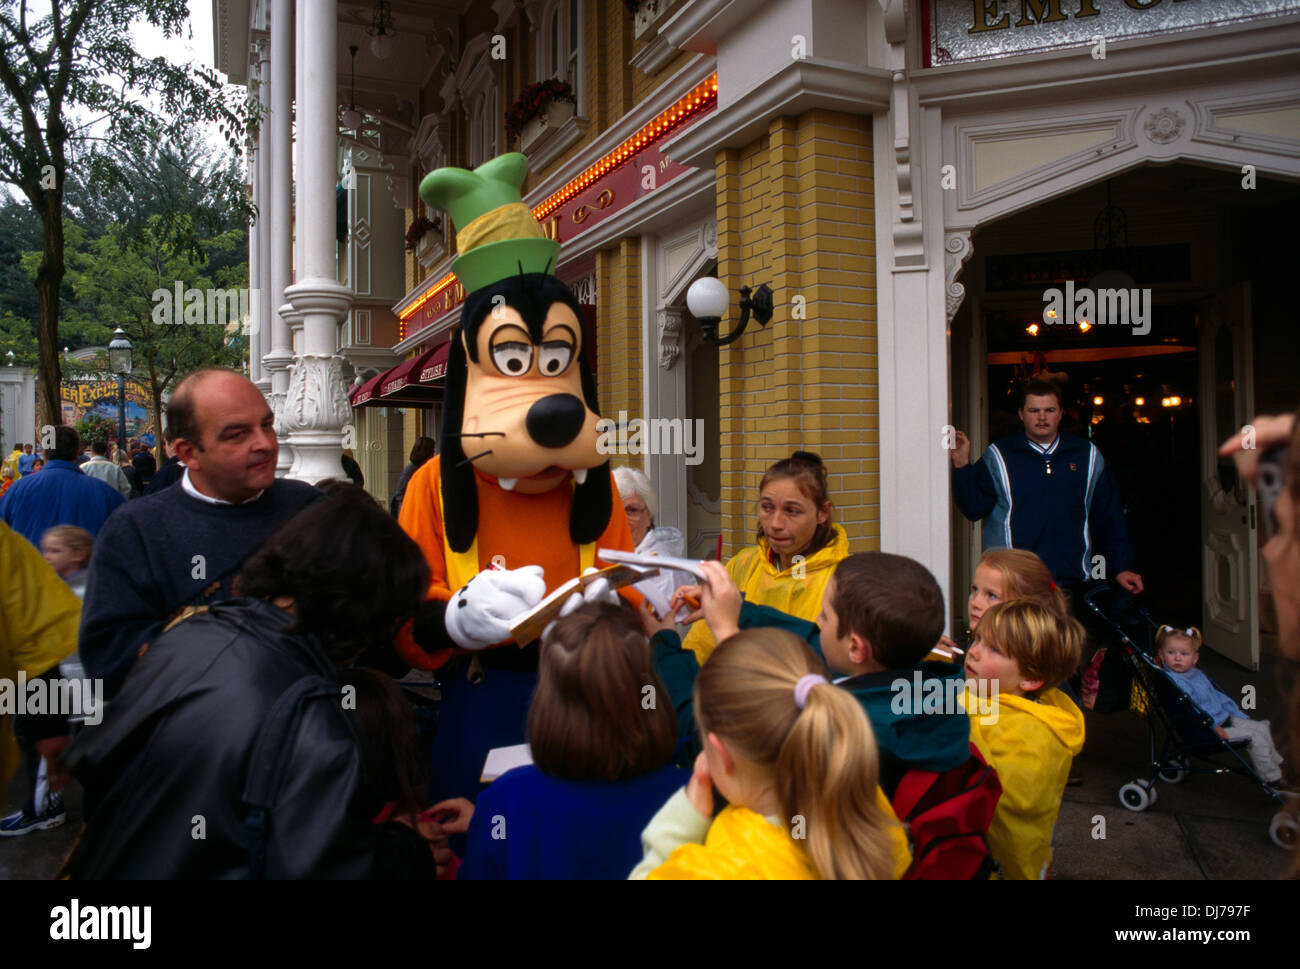 Francia Paris Eurodisney Goofy firmando autógrafos Foto de stock